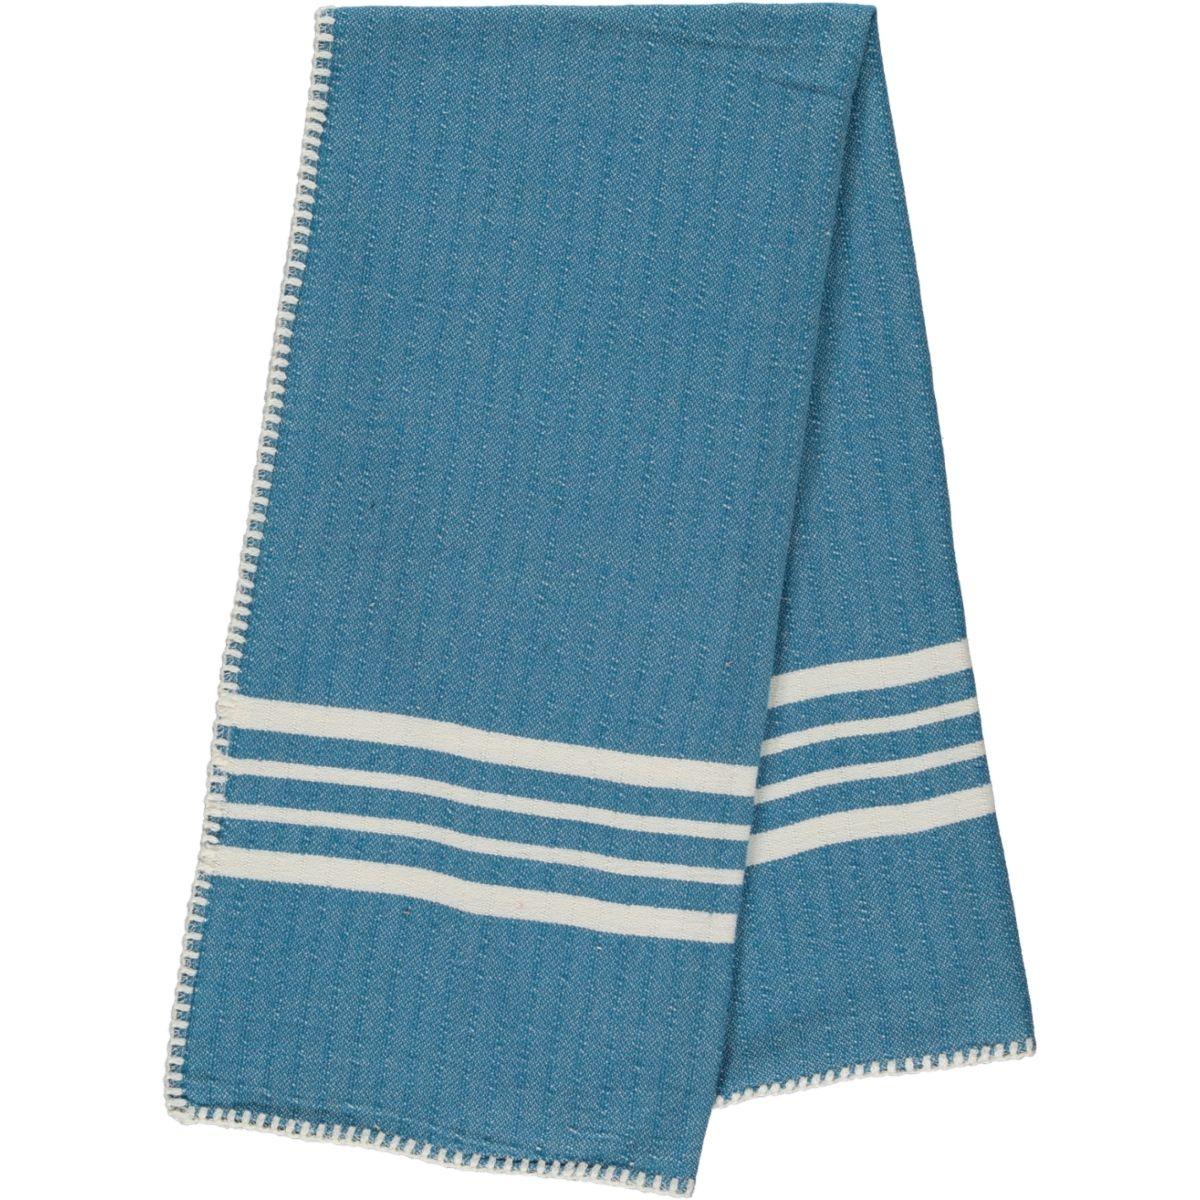 Peshtemal / Towel Sultan - Stitched / Petrol Blue